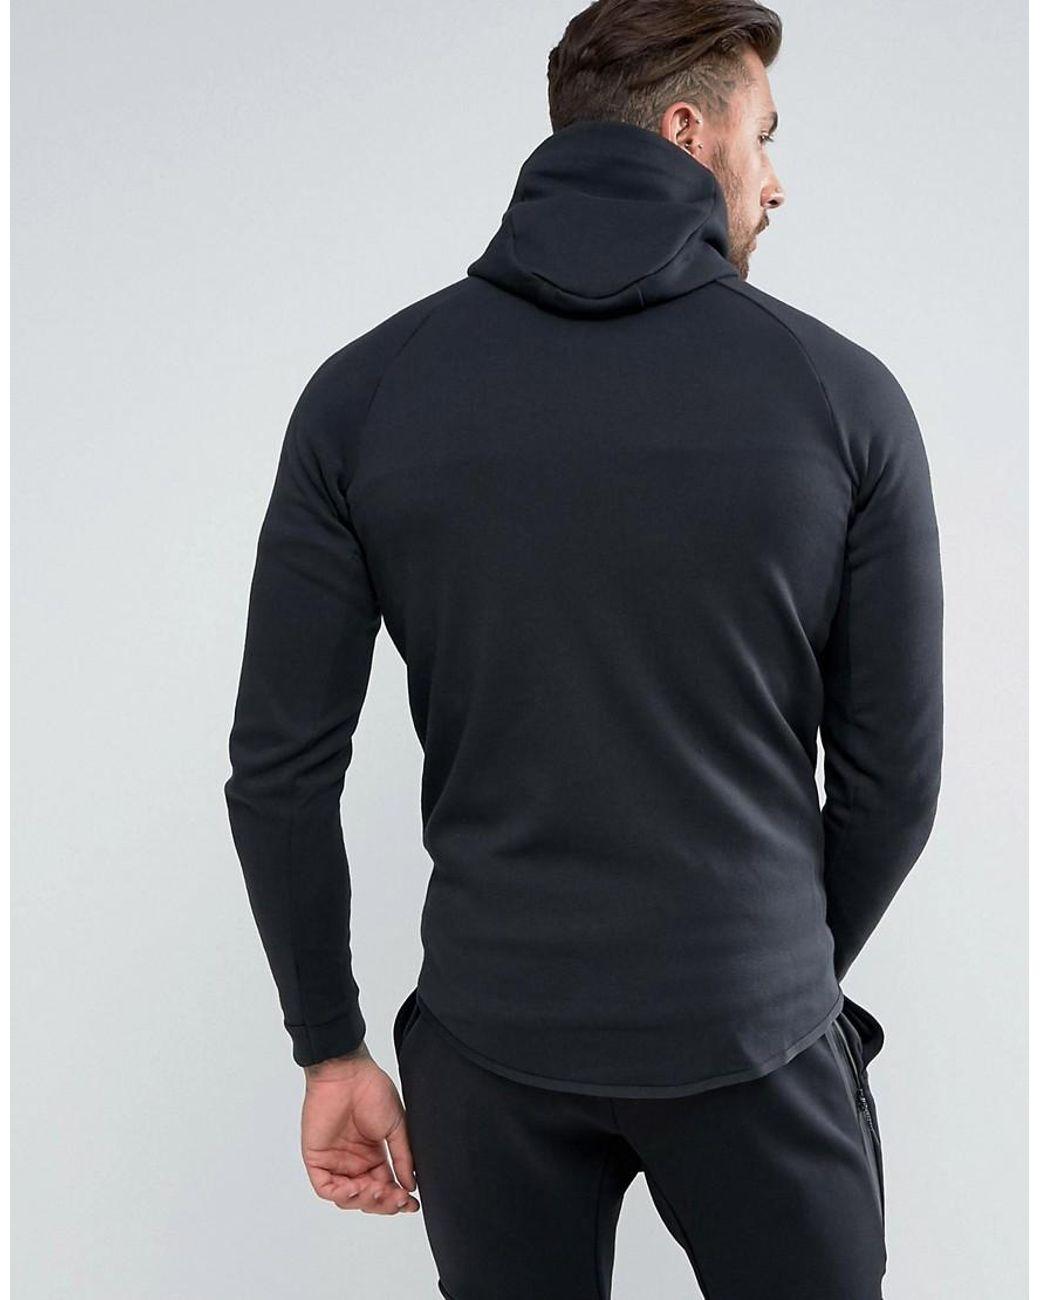 pantalon nike tech fleece zalando